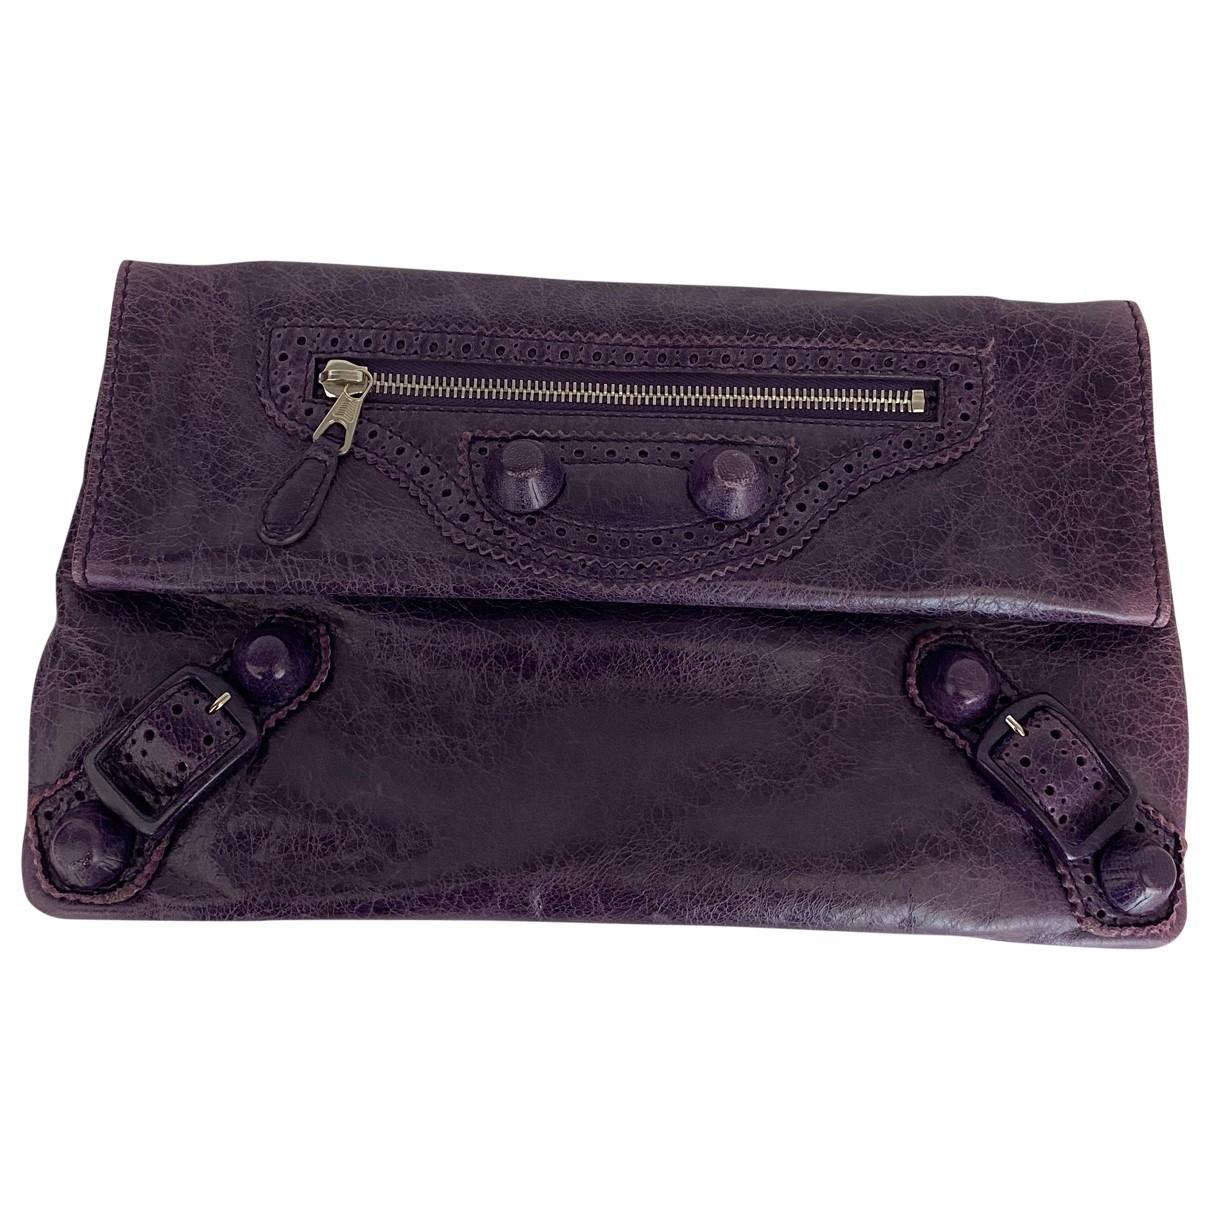 Balenciaga Envelop Purple Leather Clutch bag for Women \N